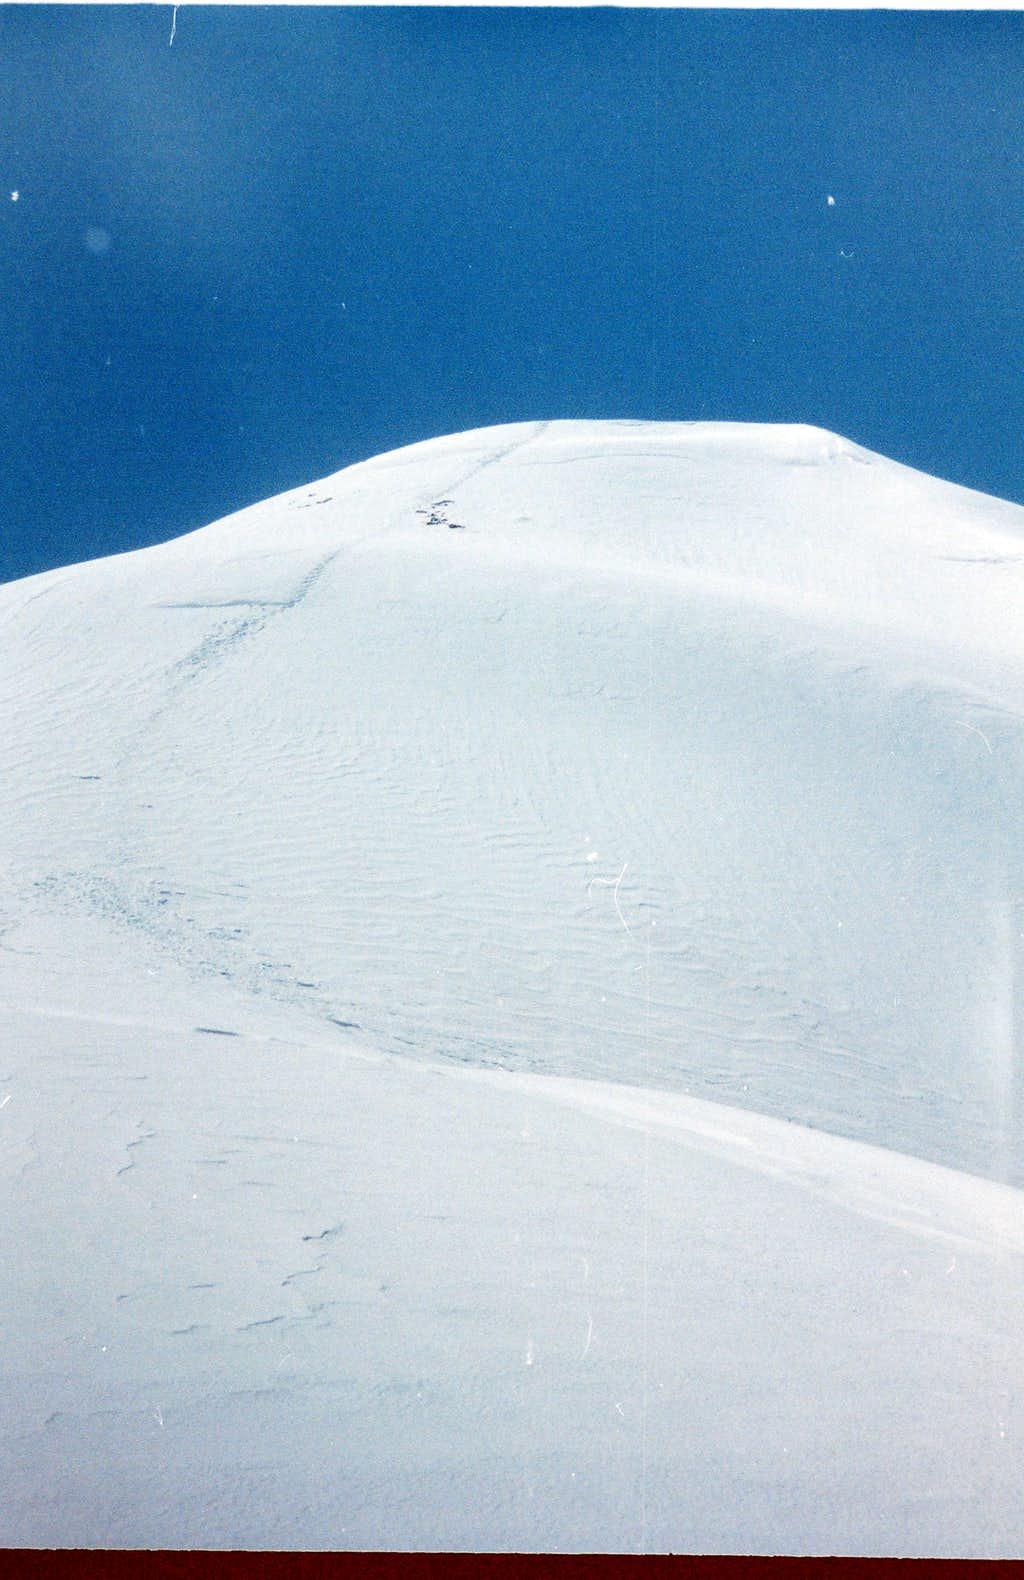 Monte Perdido summit